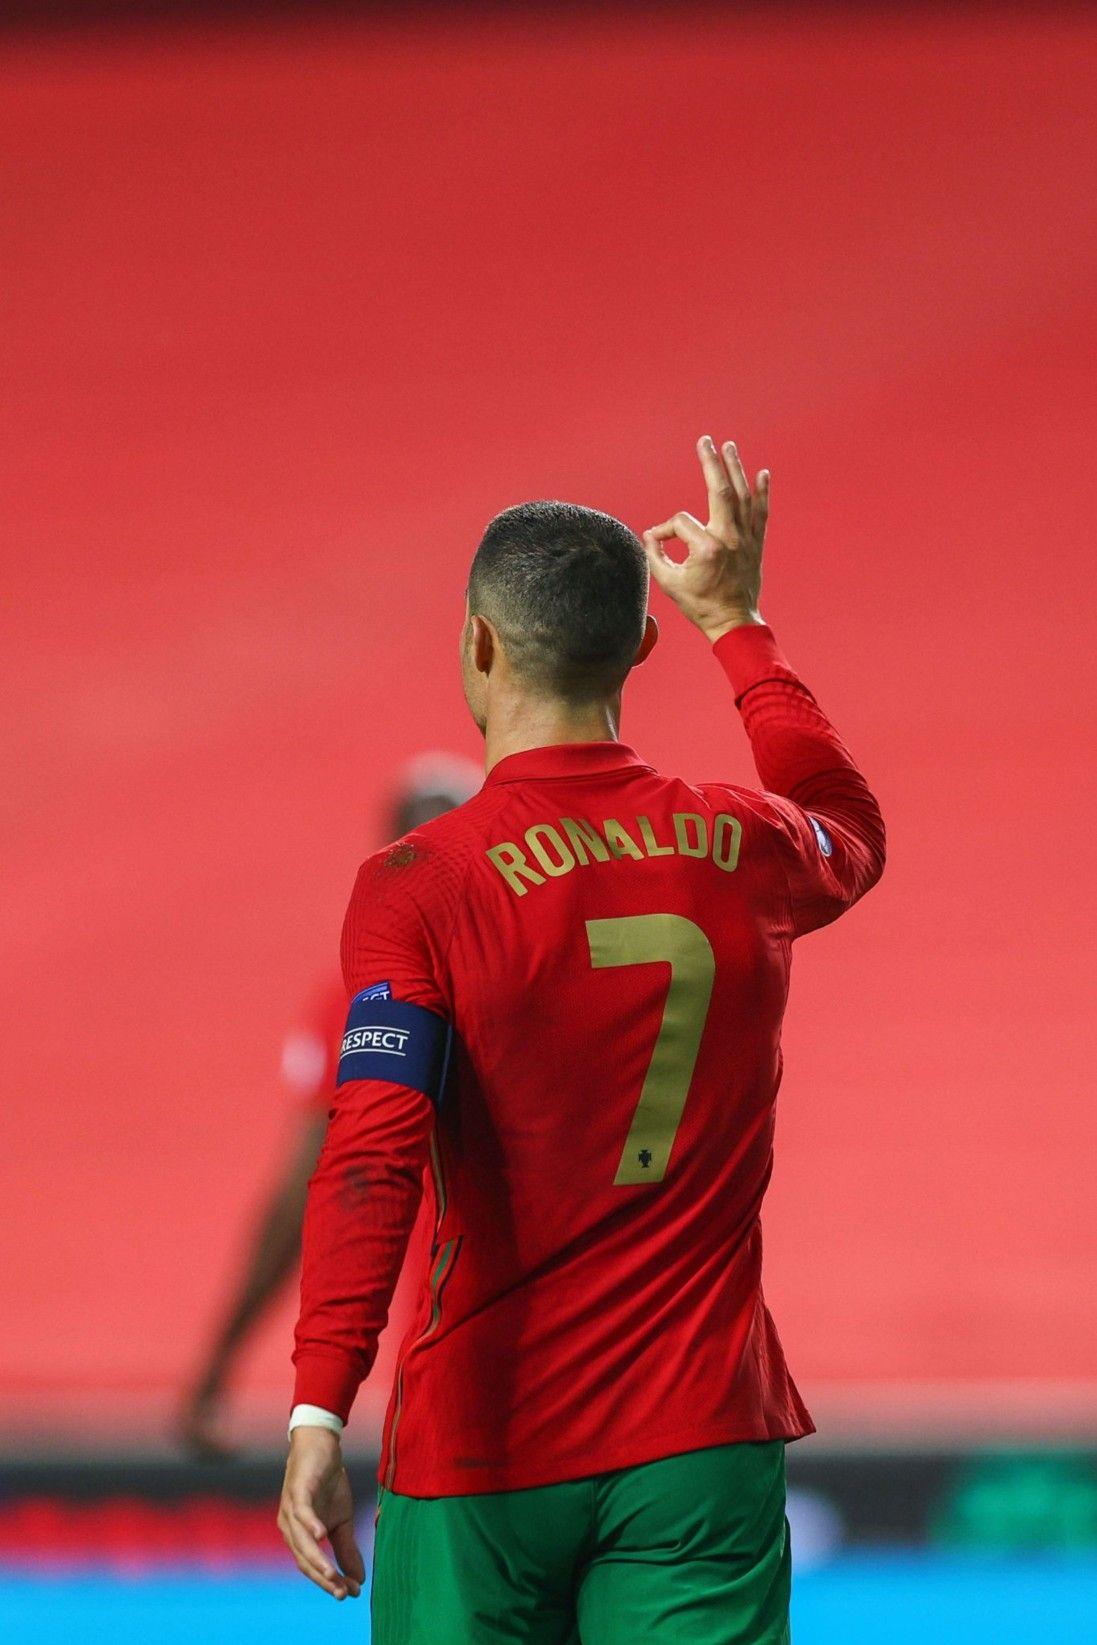 Pin By Daniel Josue Quintanilla Luzur On Cristiano Ronaldo Ronaldo Football Ronaldo Cristiano Ronaldo